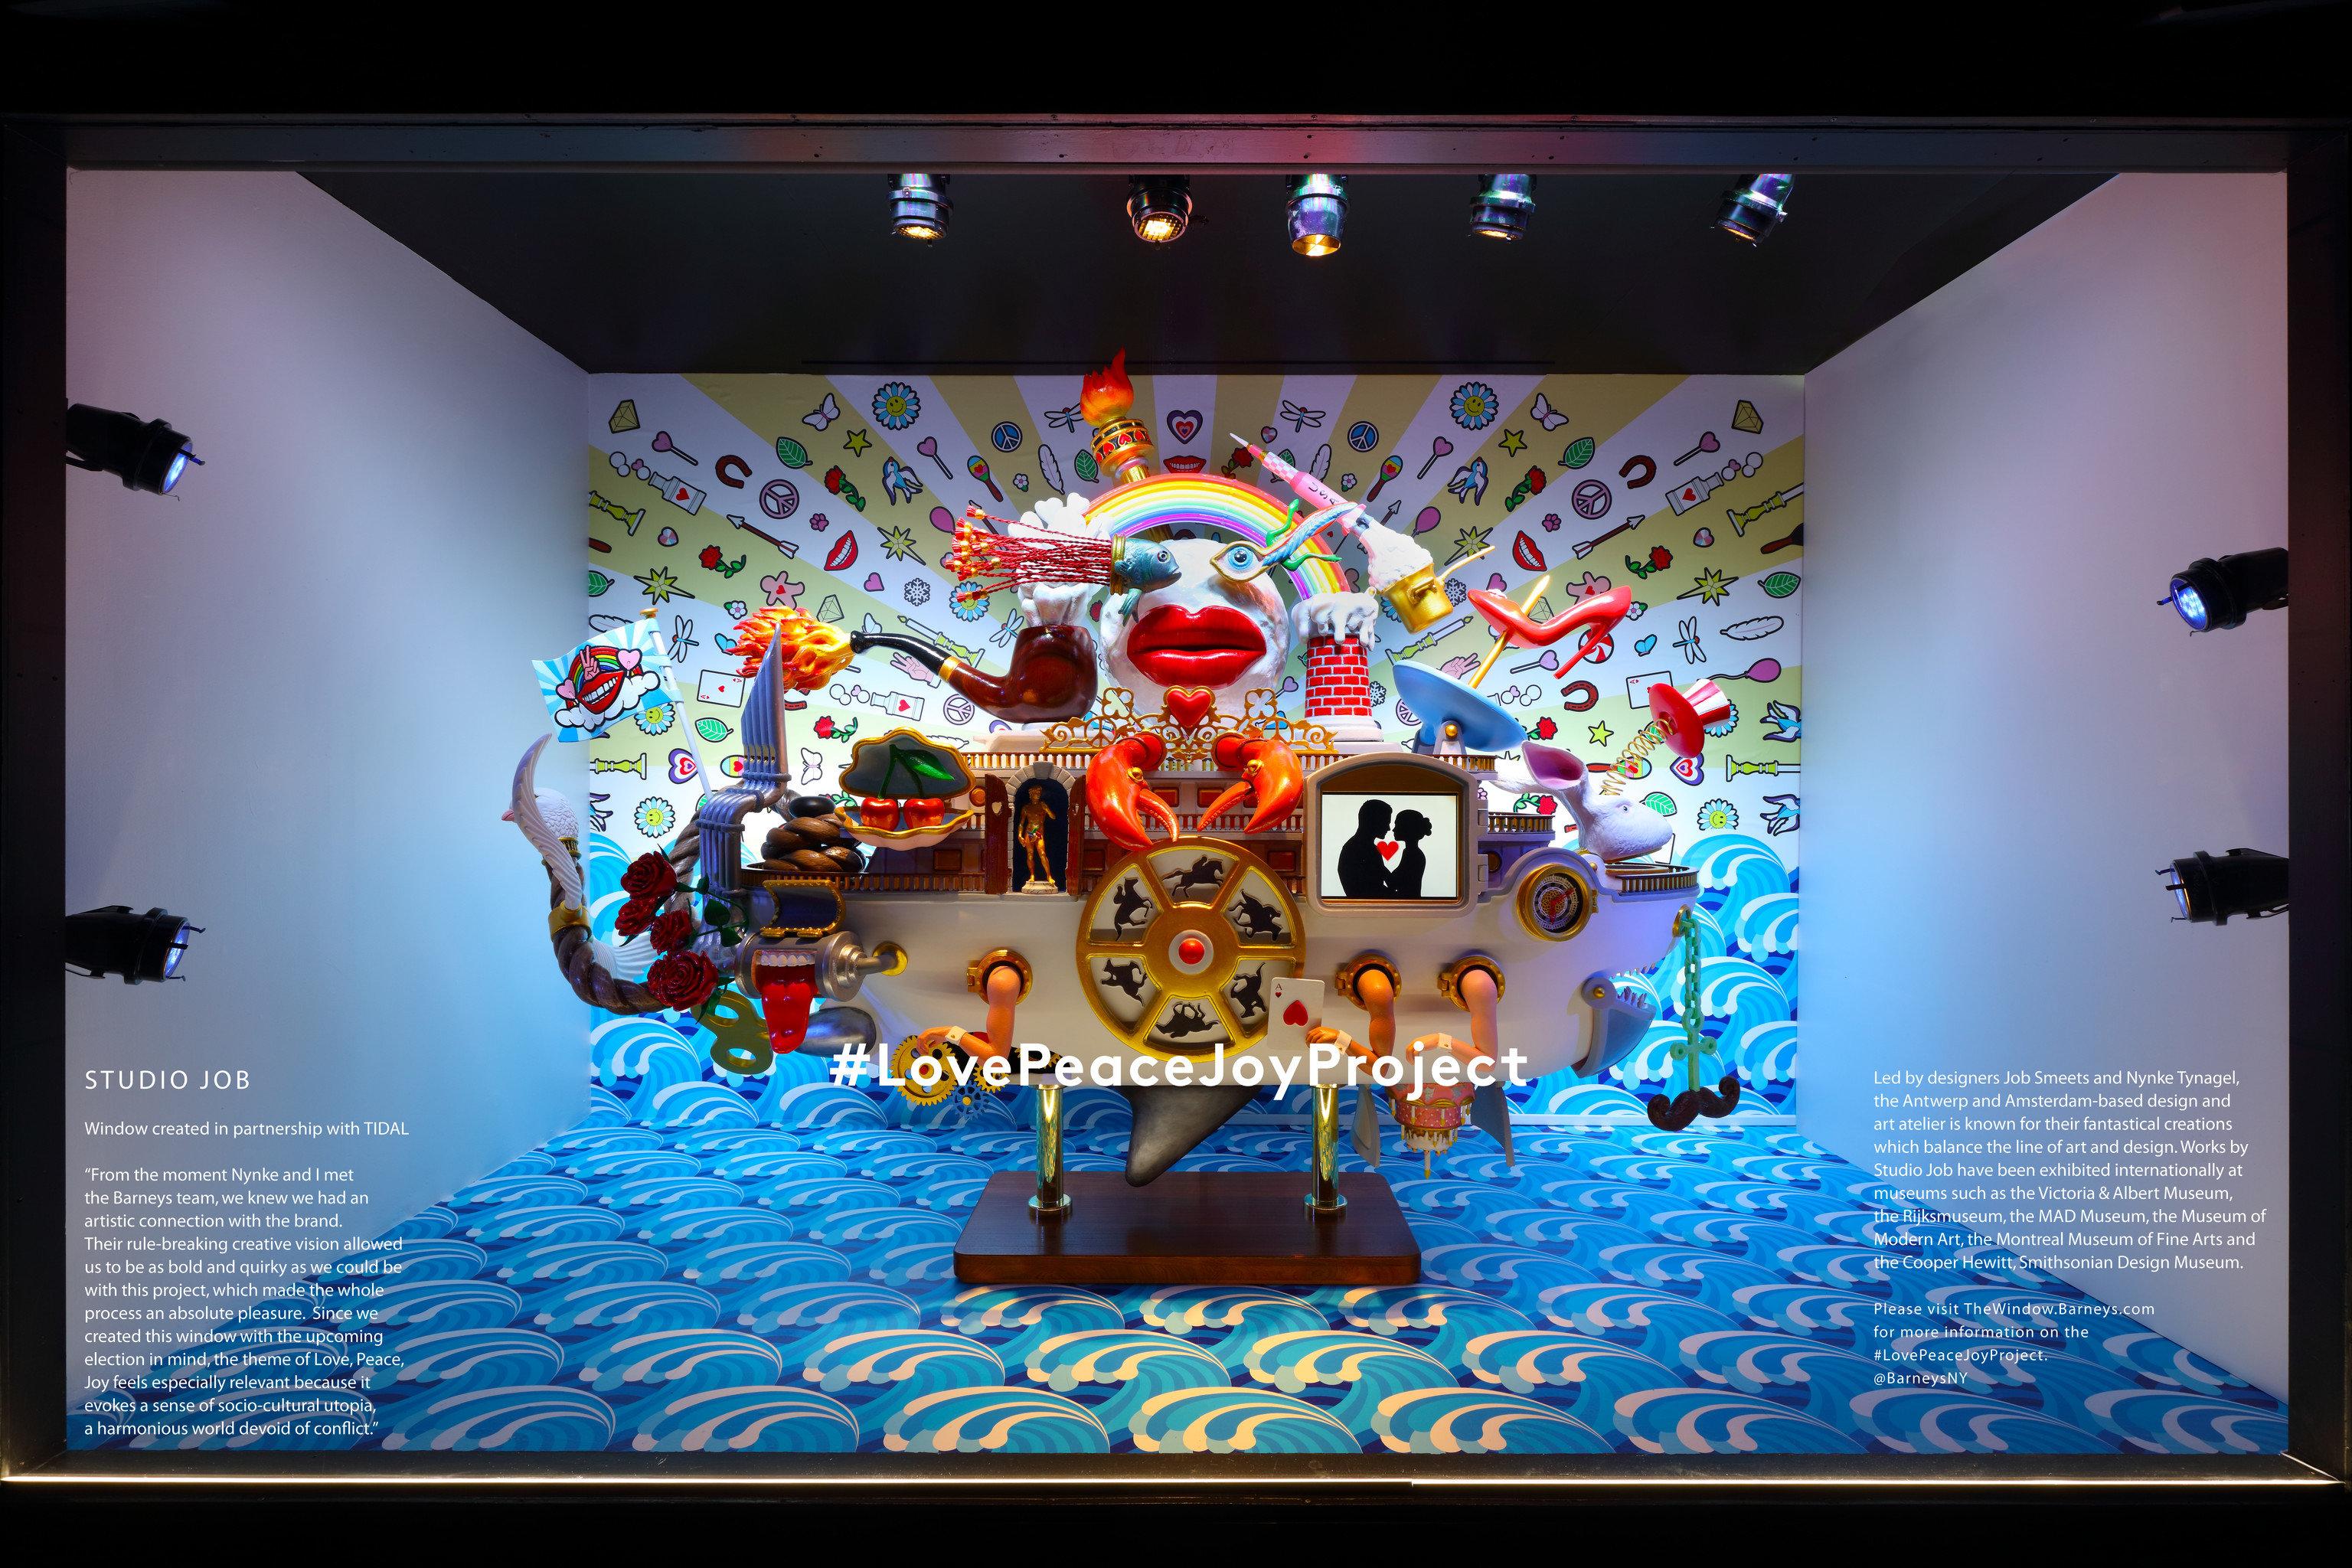 Trip Ideas indoor art screenshot display device decorated display